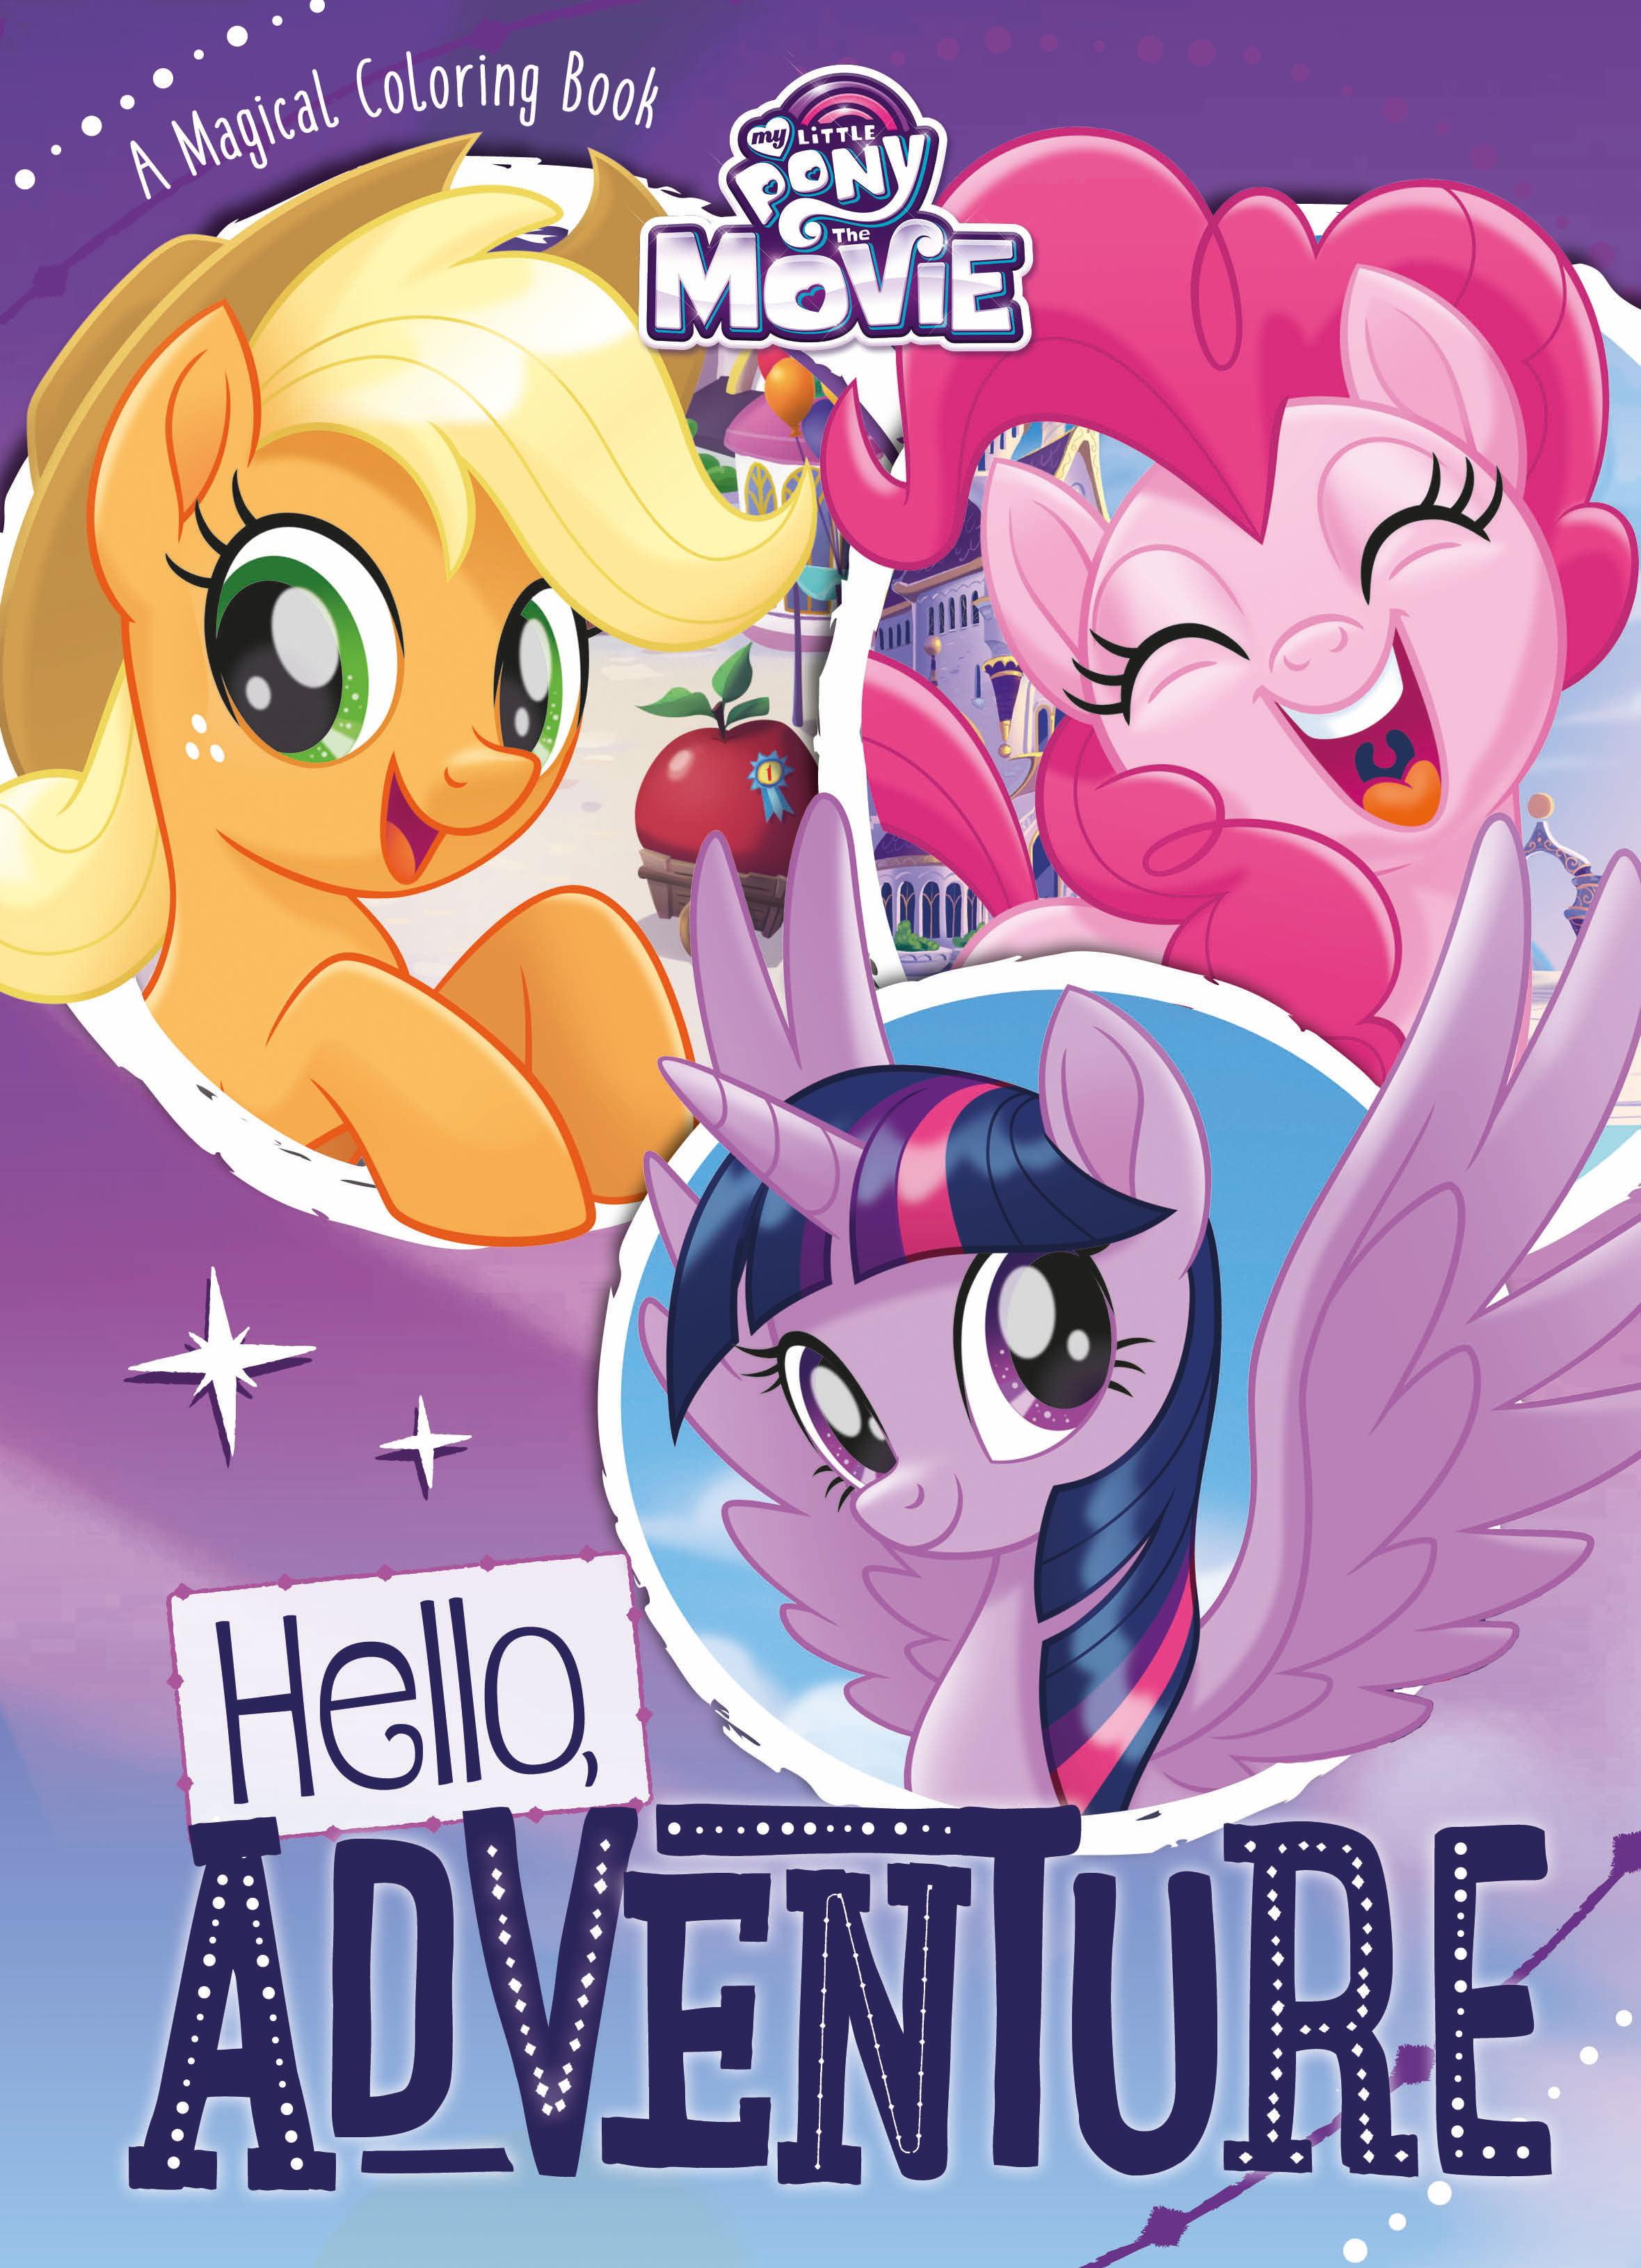 My Little Pony The Movie Hello Adventure A Magical Coloring Book Paperback Walmart Com Walmart Com